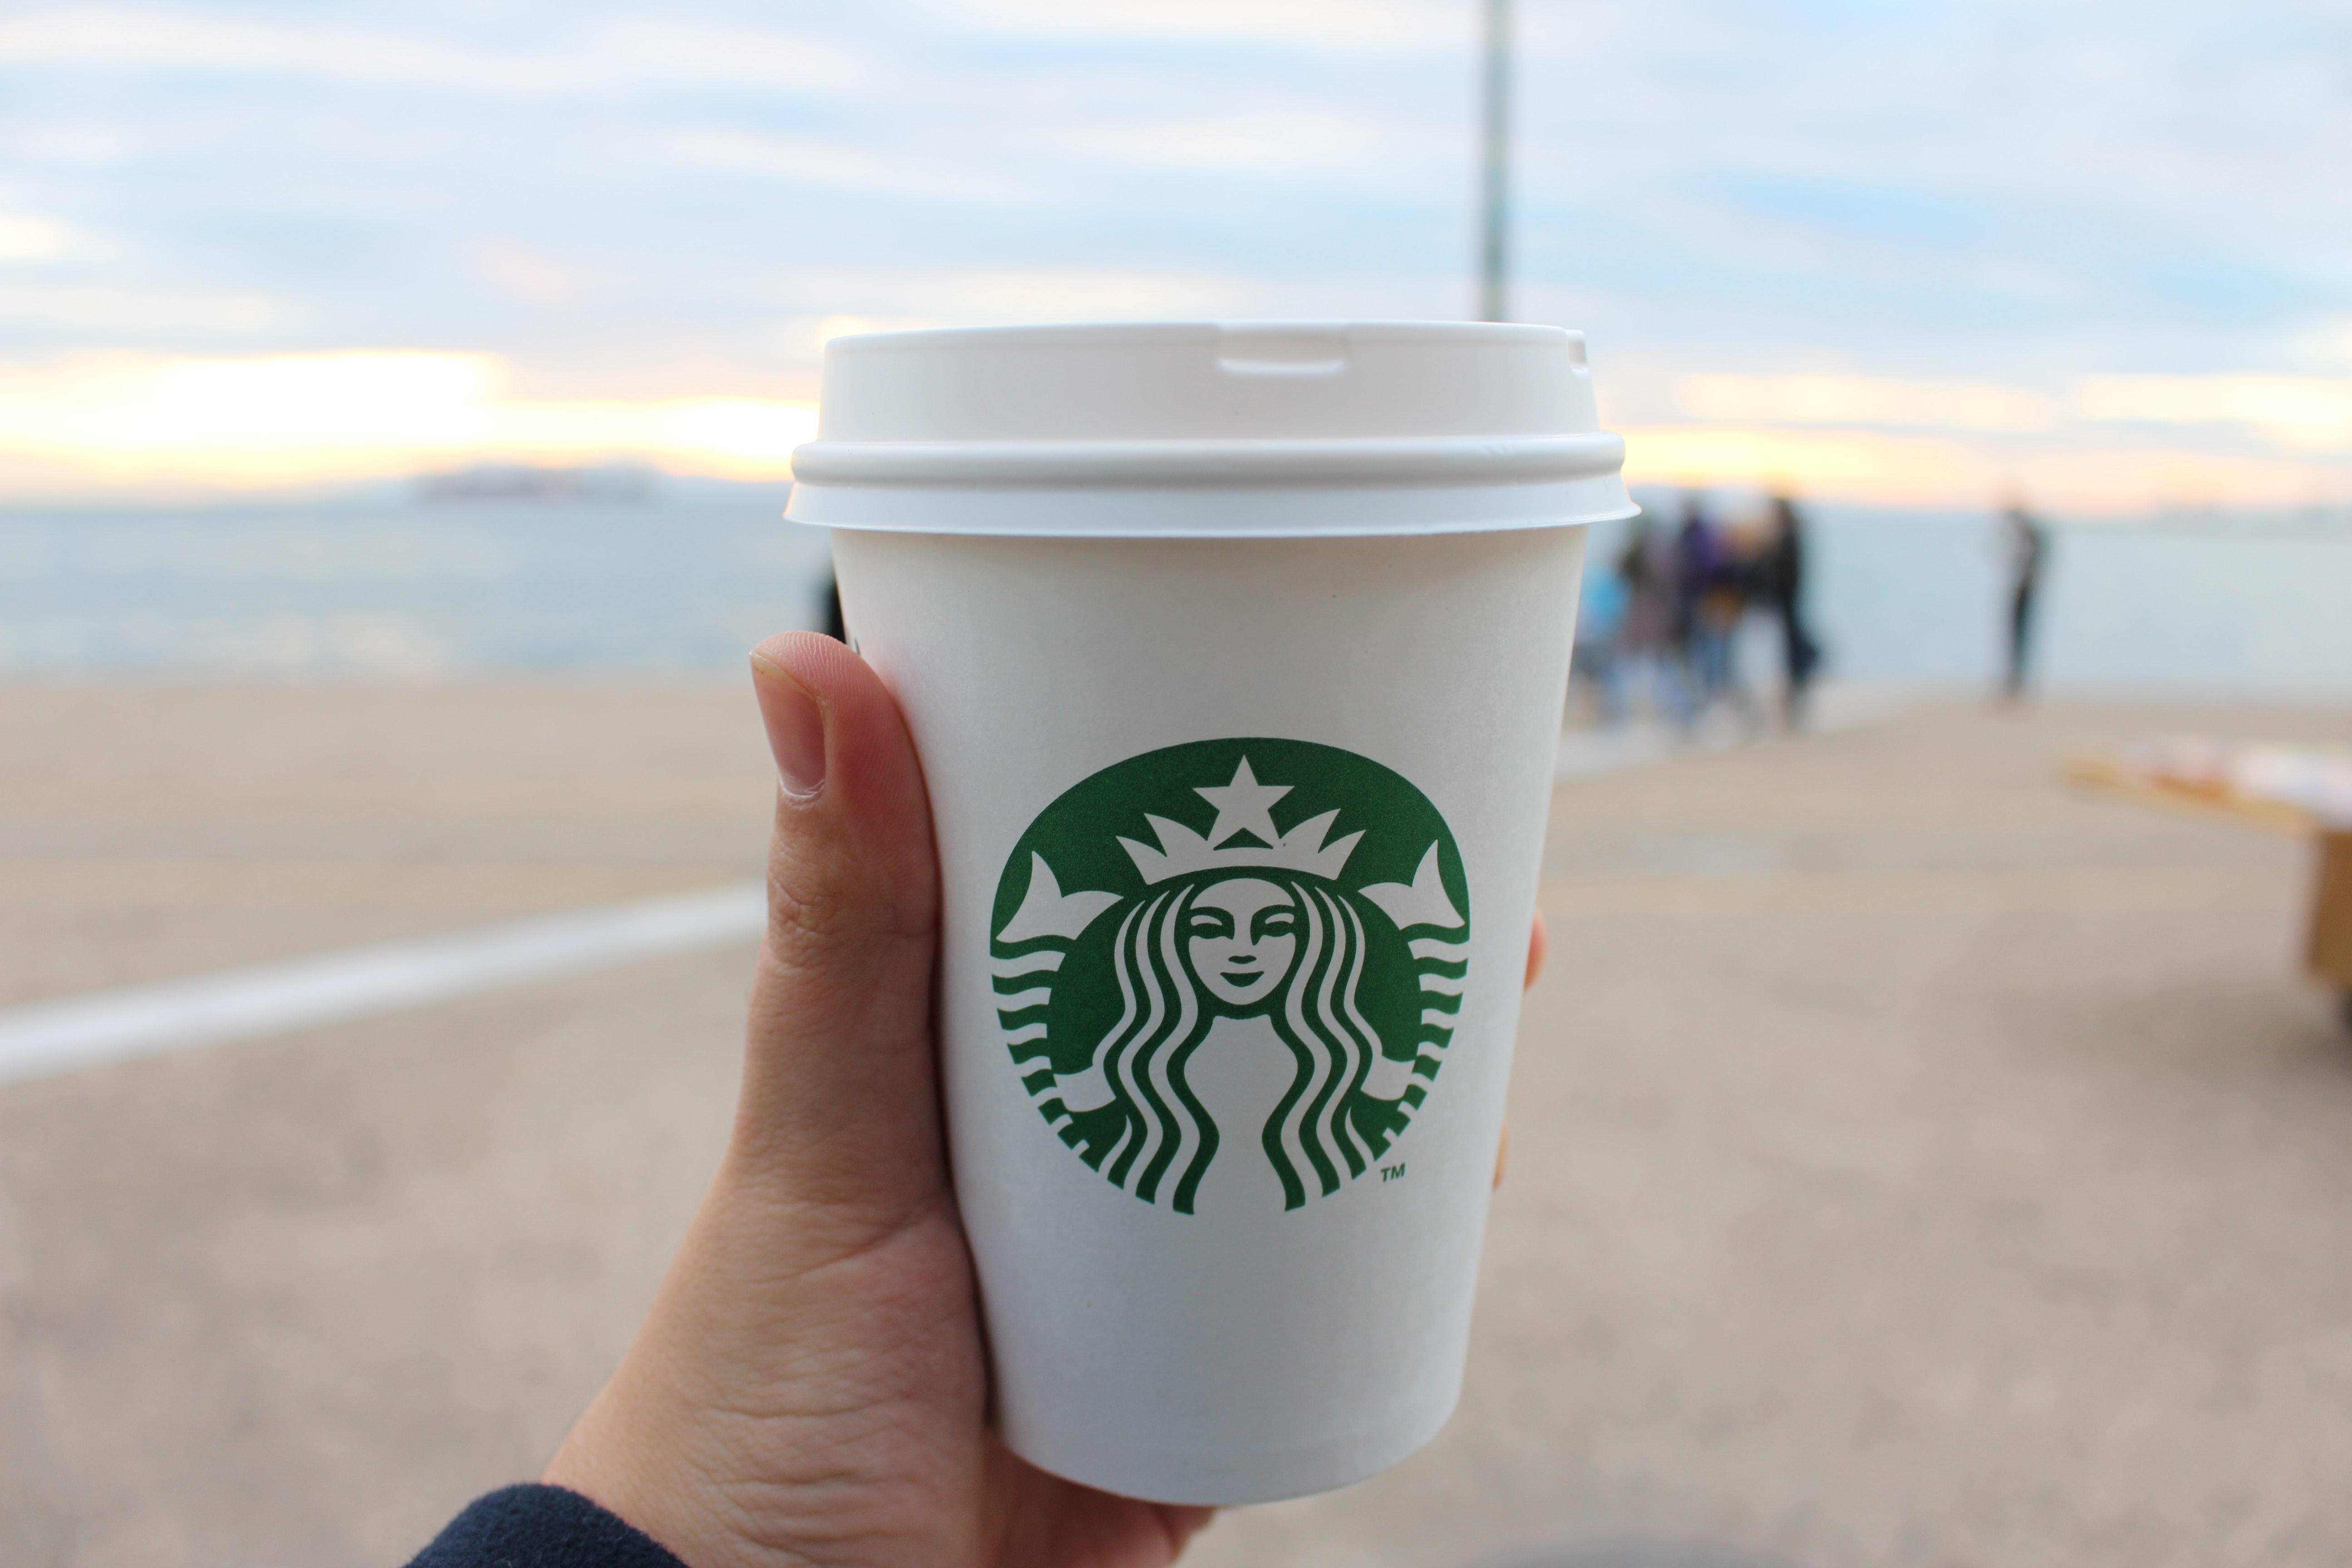 Person Holding Star Buck Plastic Cup, Blur, Mug, Sky, Sea, HQ Photo